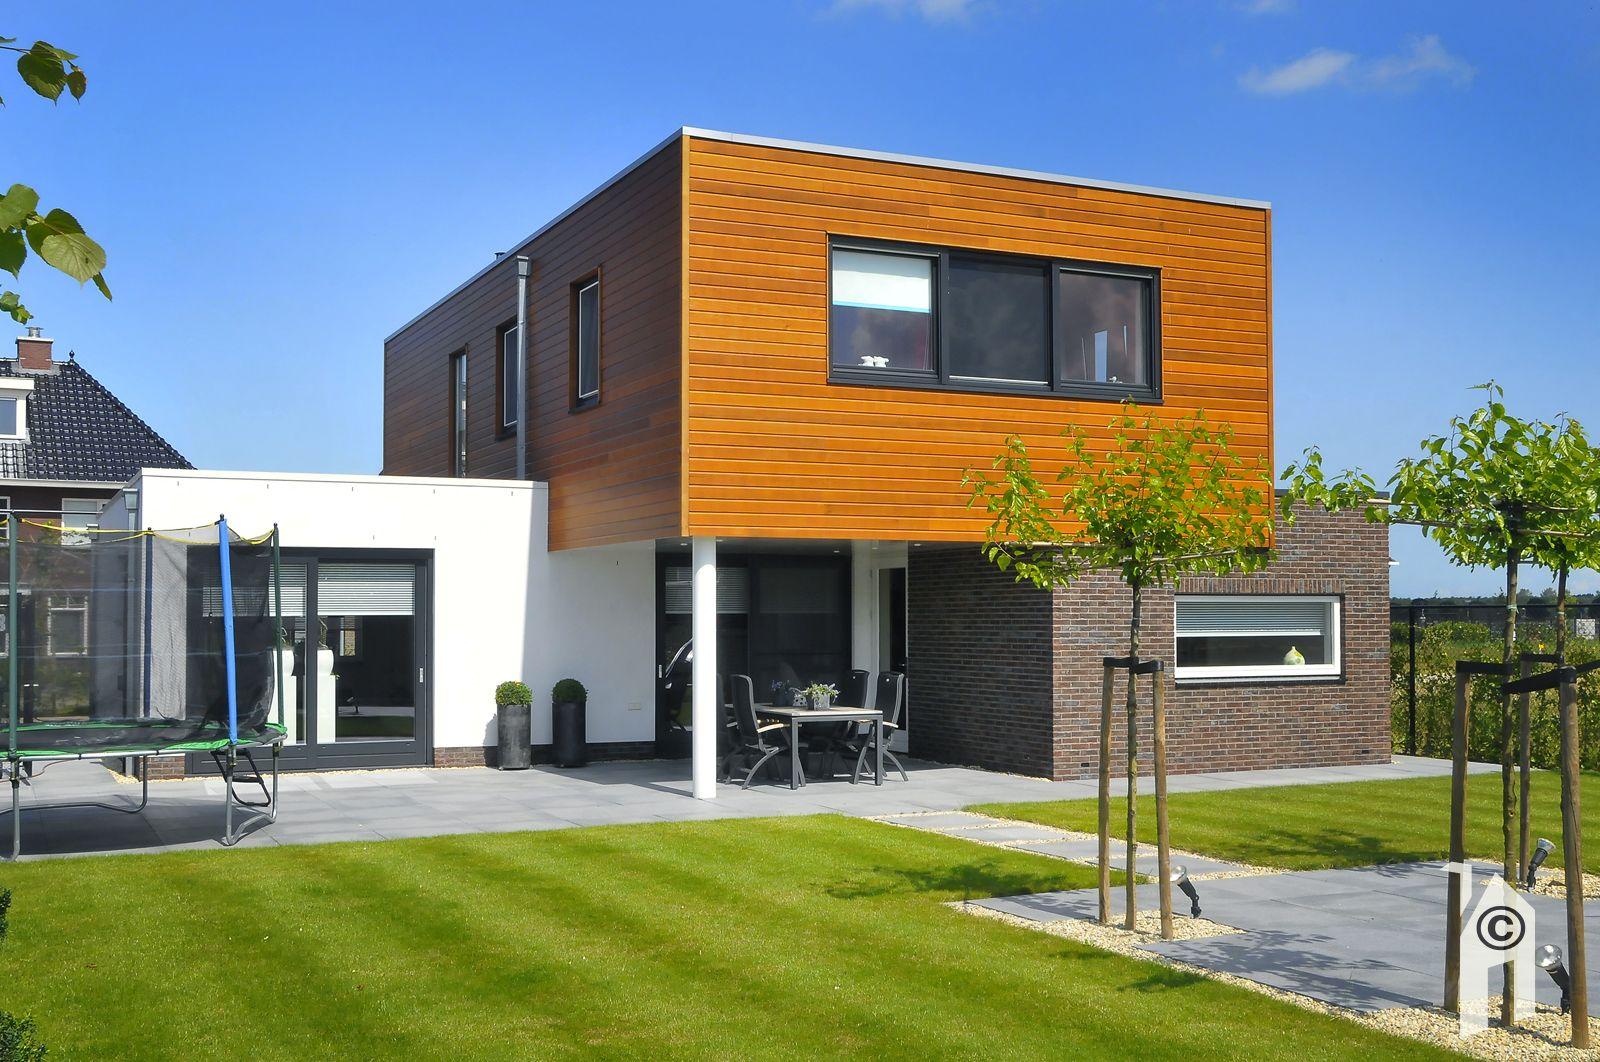 Presolid home b v goede architect of aannemer for Vrijstaand huis laten bouwen